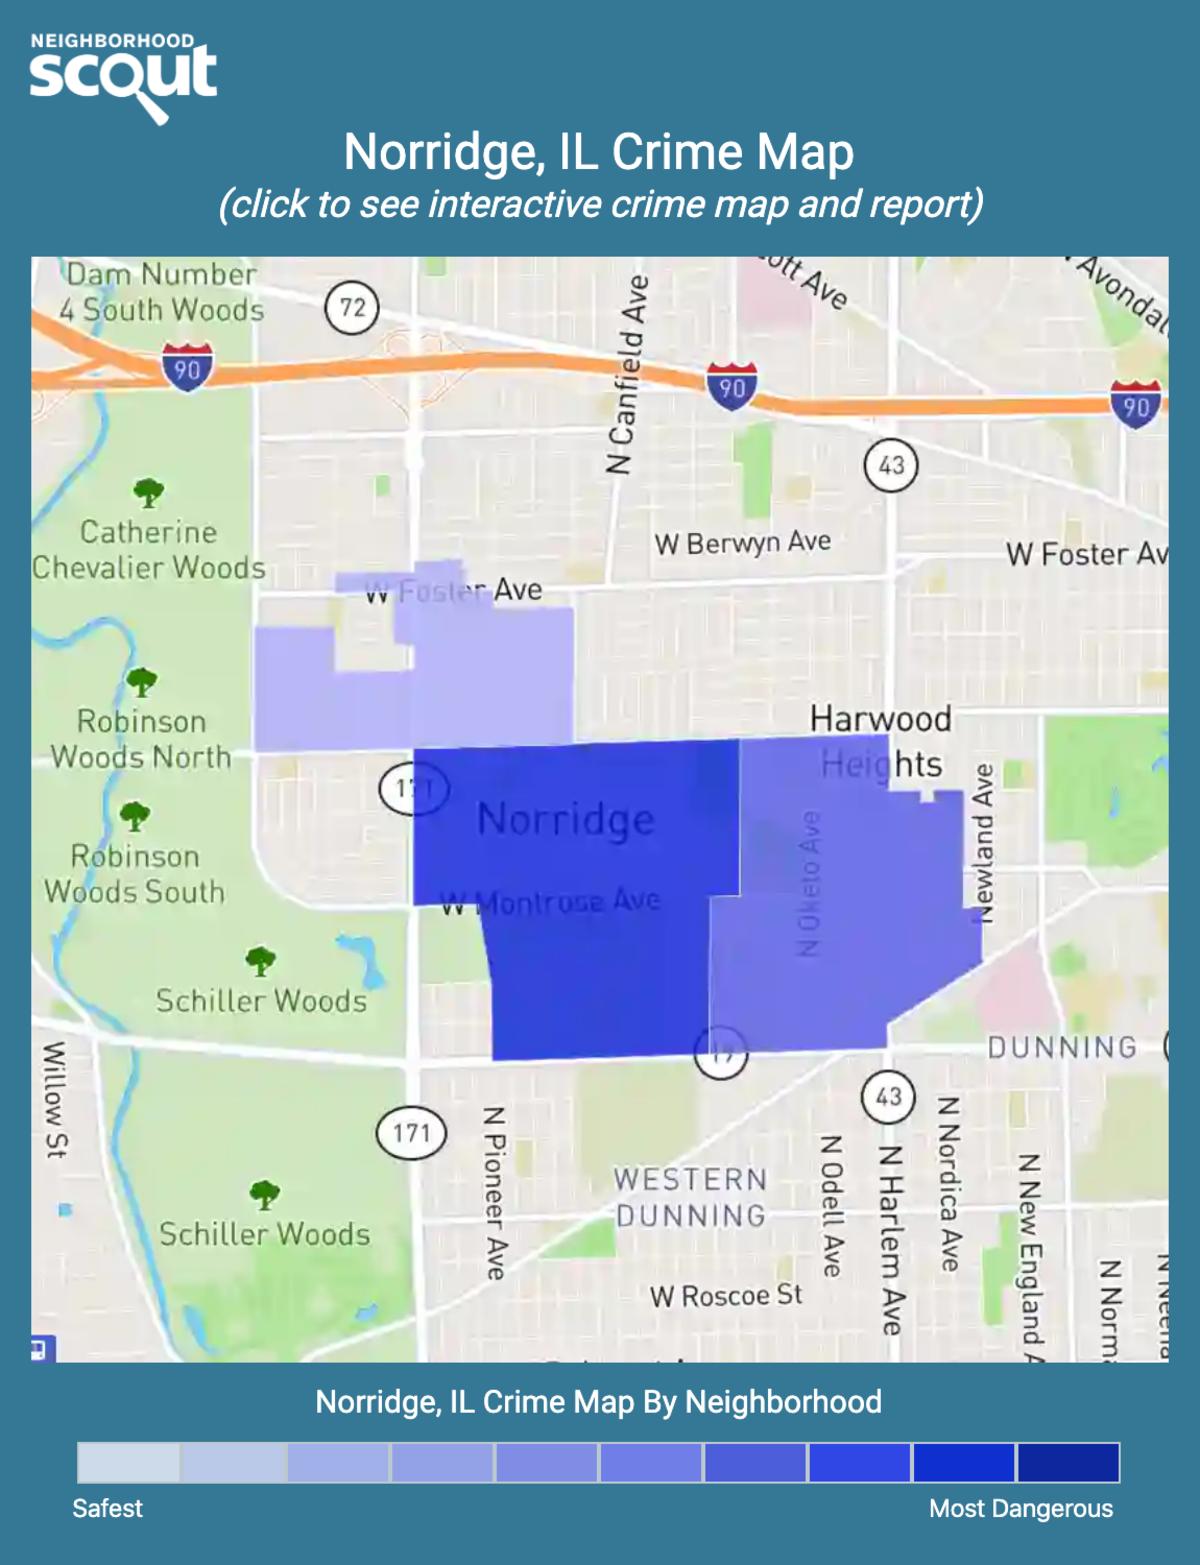 Norridge, Illinois crime map